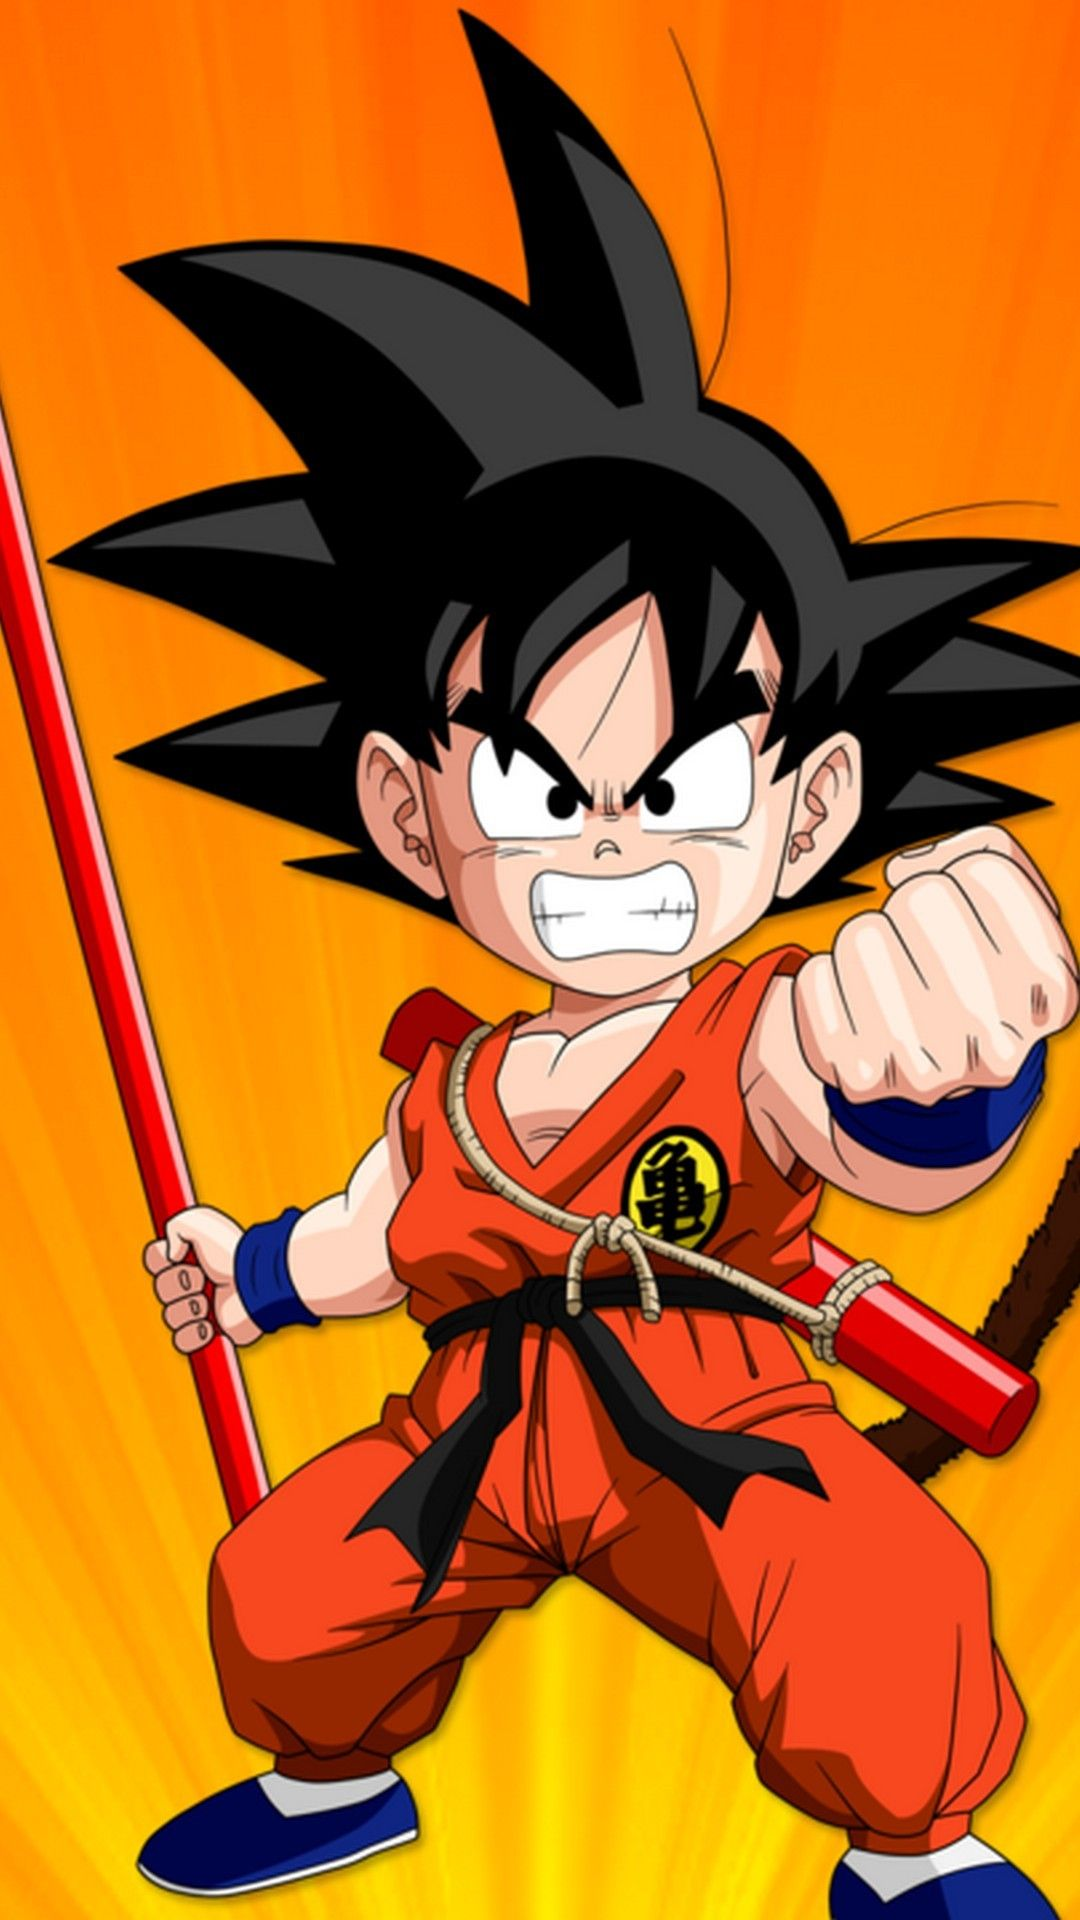 Kid Goku Wallpaper Android Goku wallpaper, Kid goku